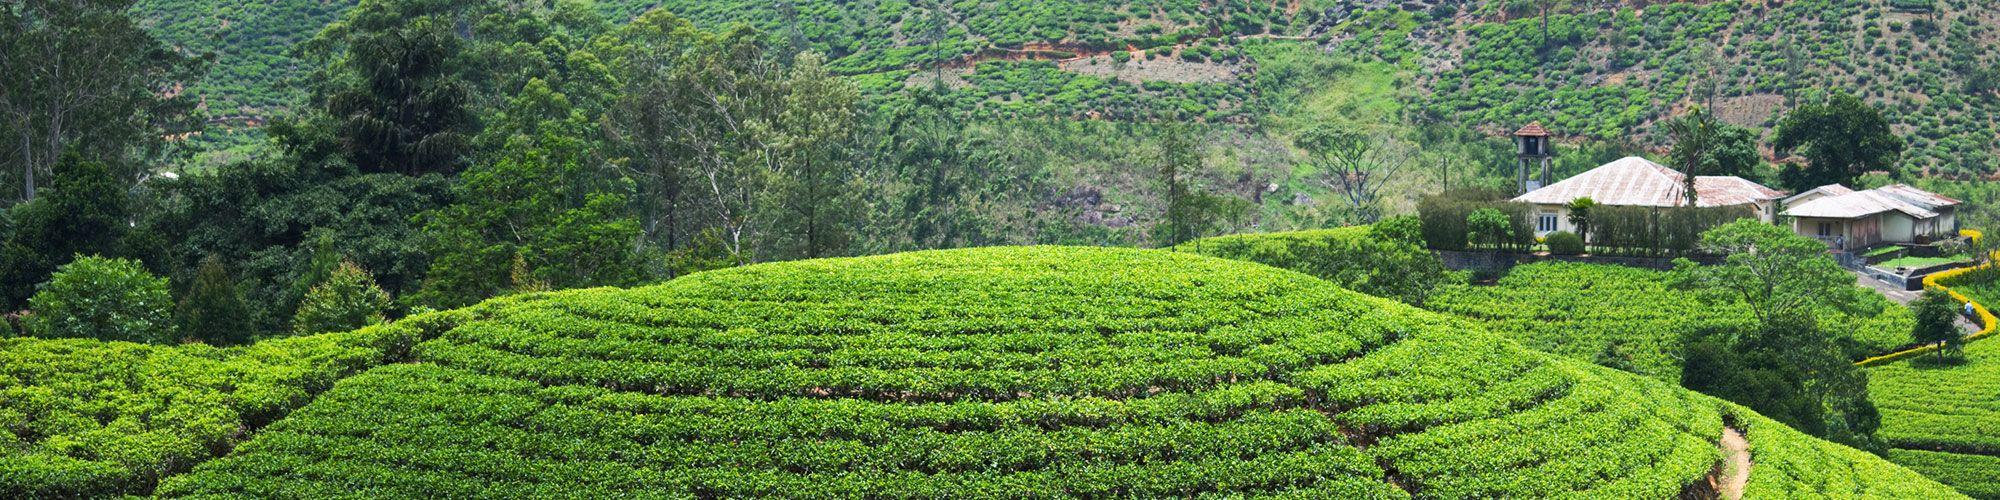 Sri Lanka, Plantations Thé, Bandarawela